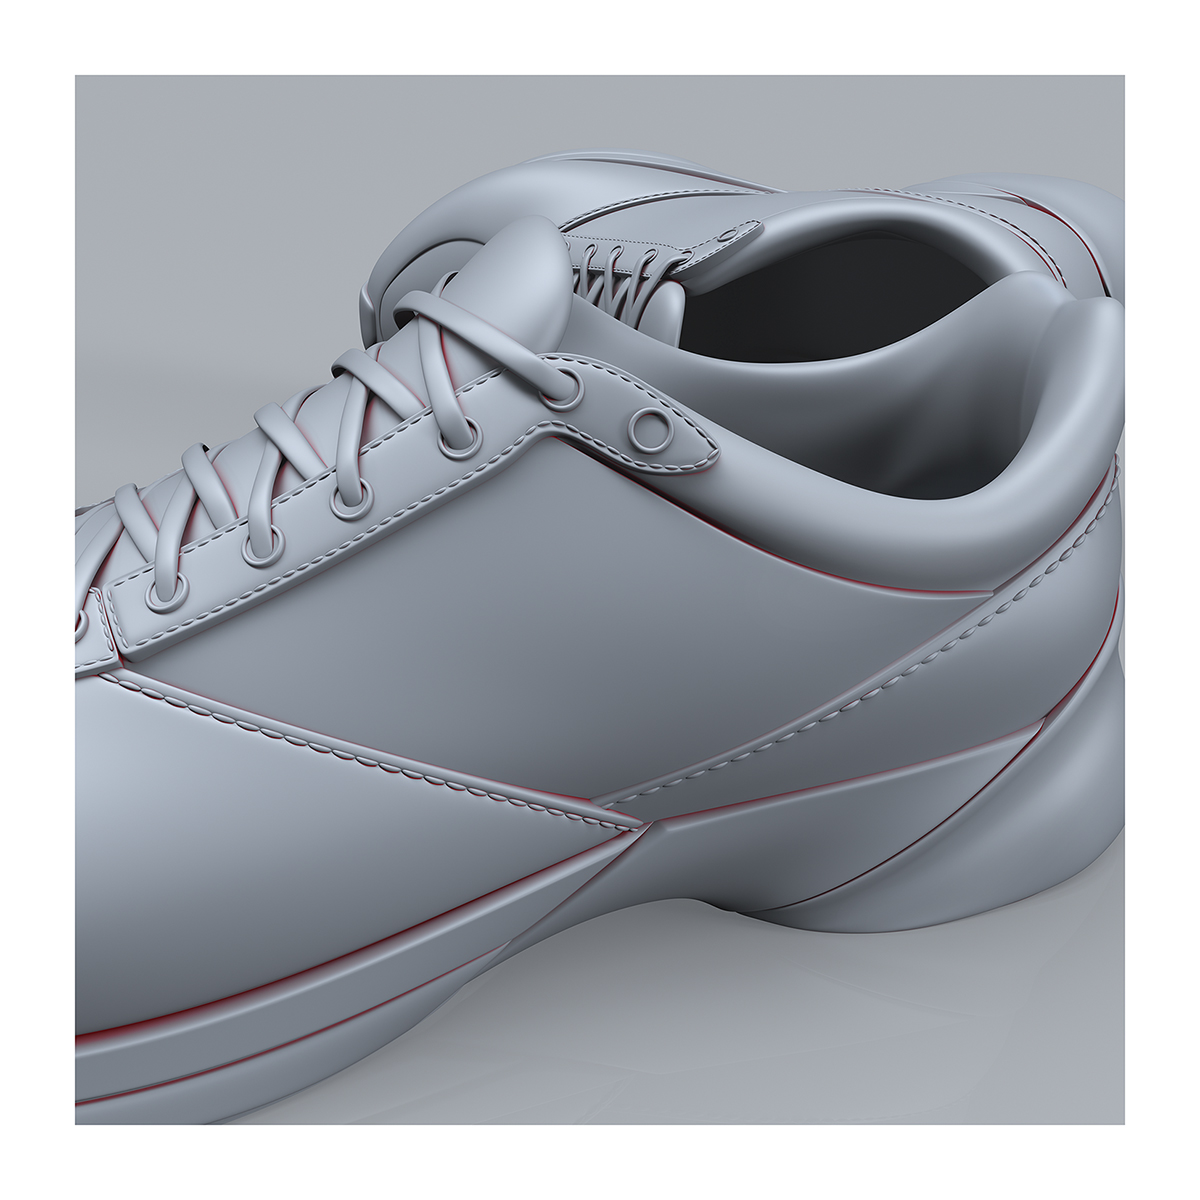 Still Life 11 003 1 - 2020 - Still Life N°11. (Shoes. Sneakers)